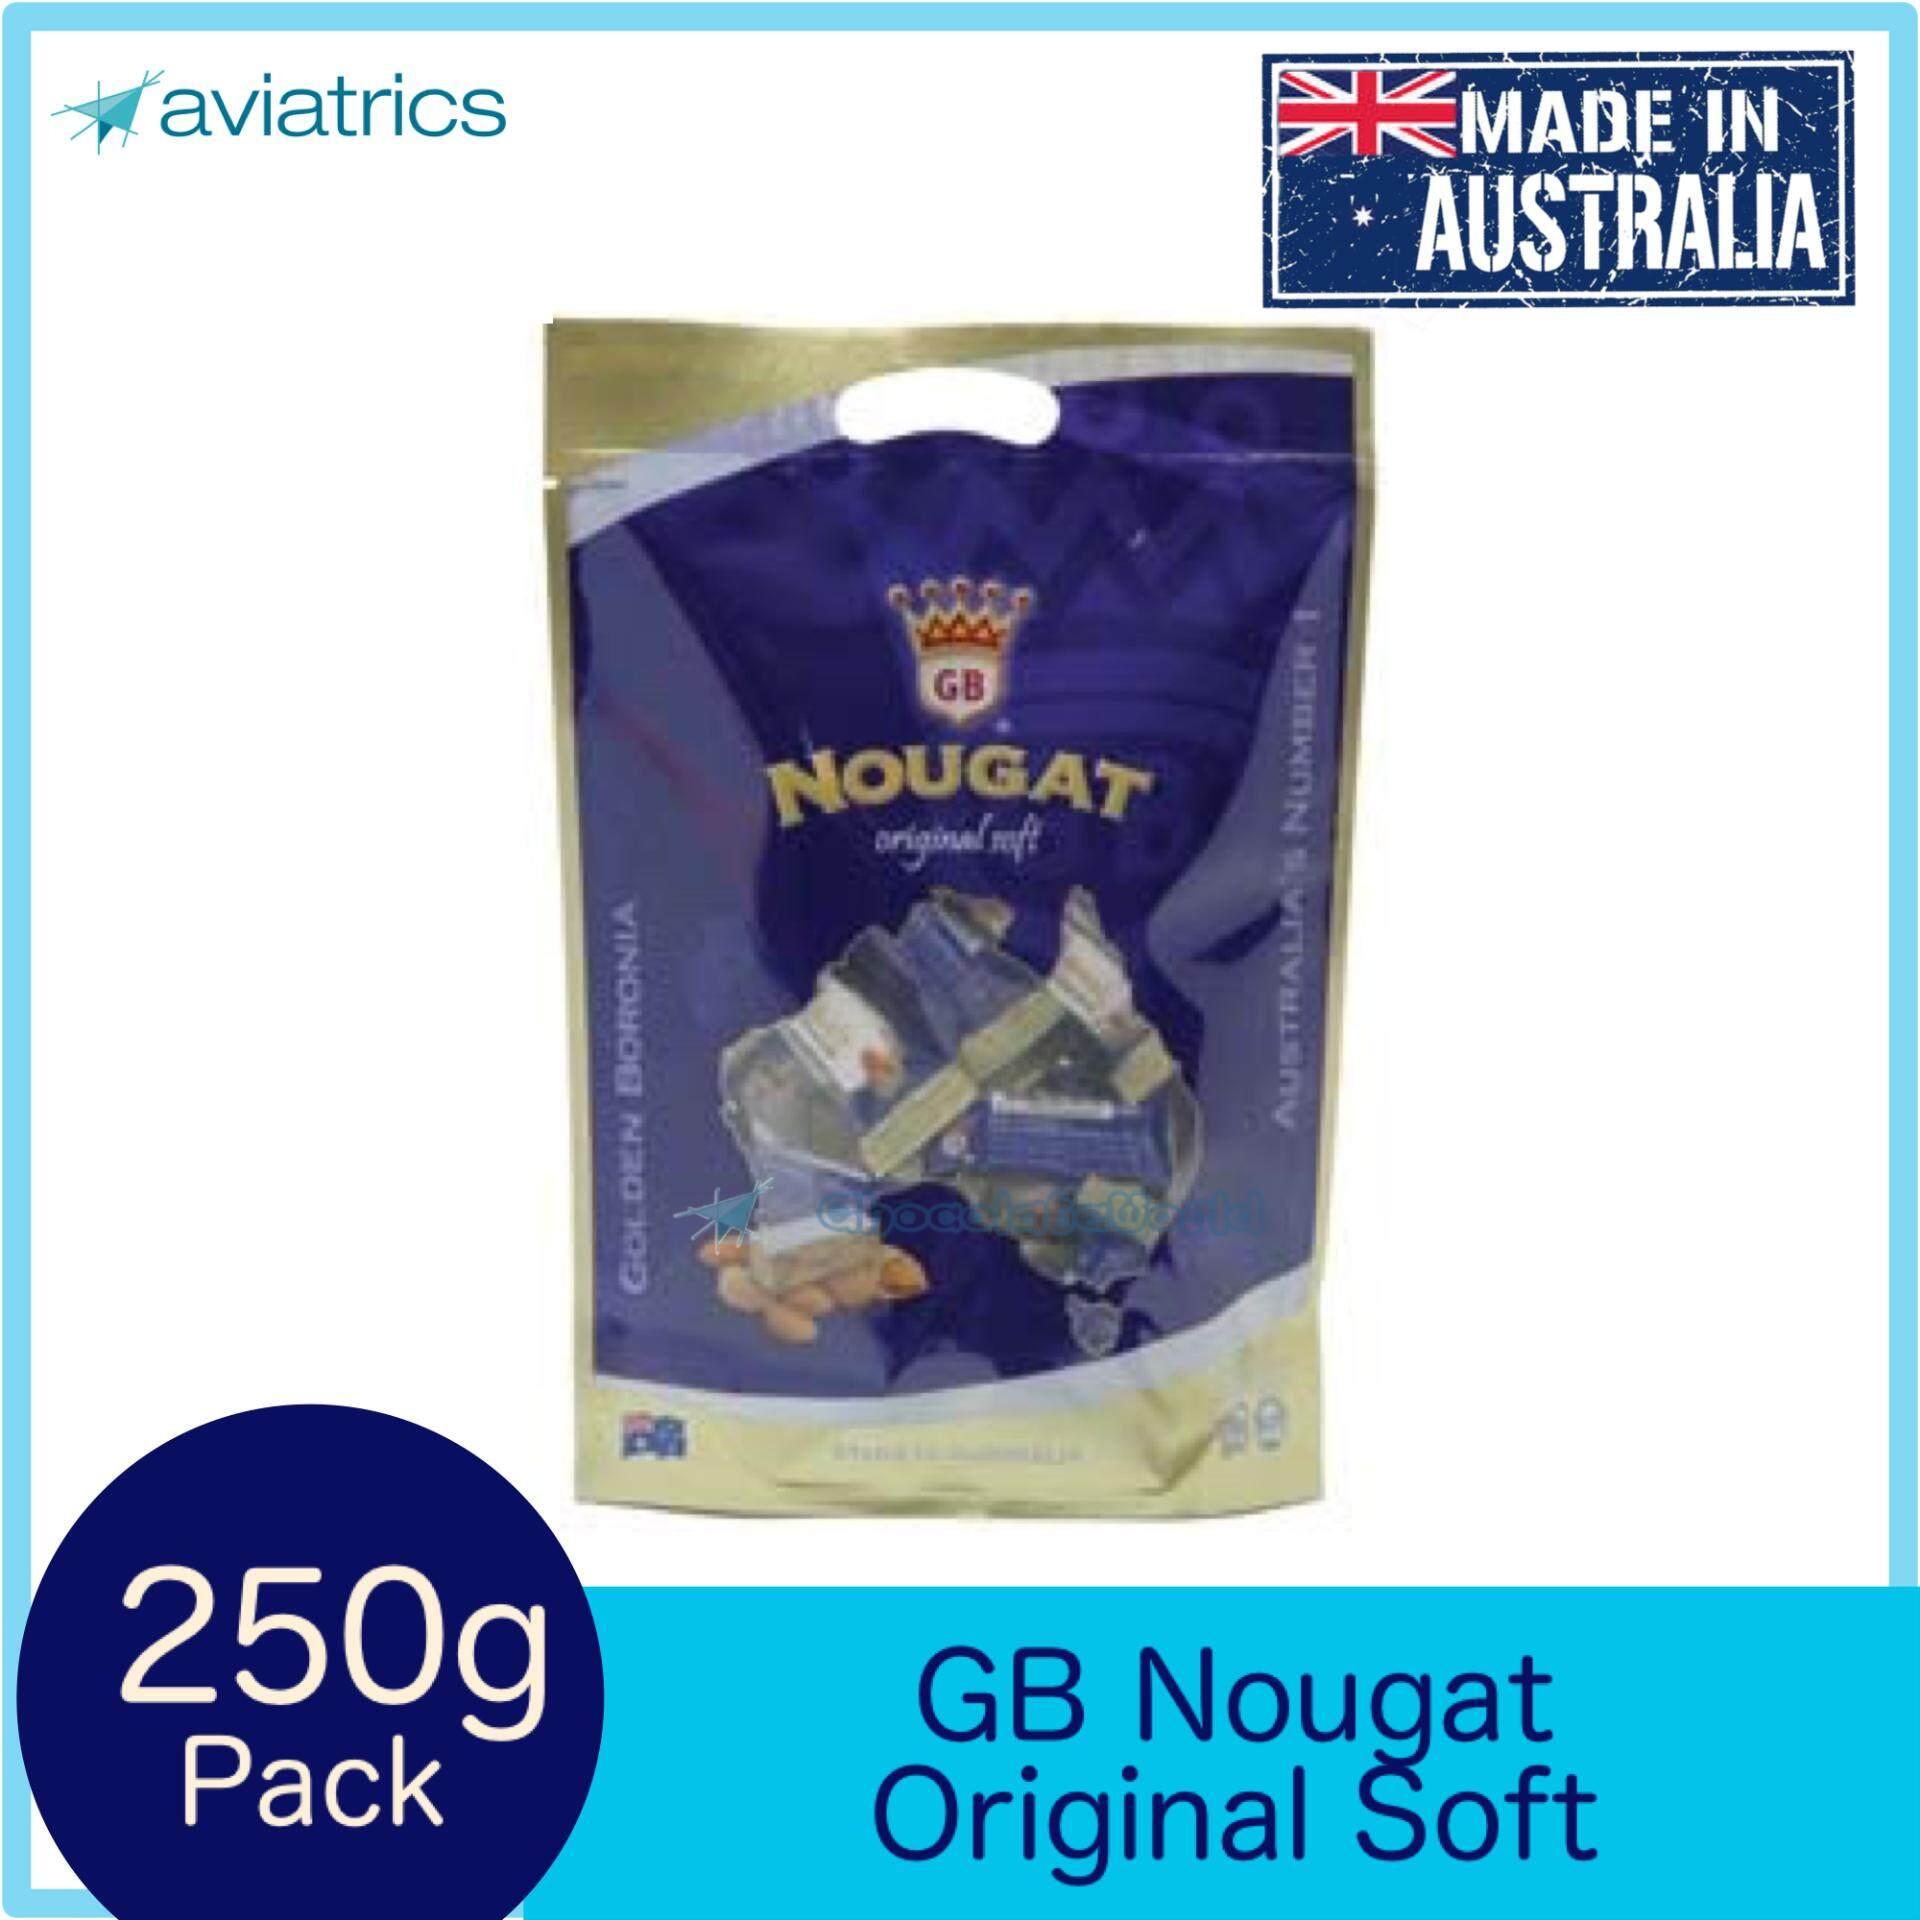 Golden Boronia Nougat Original Soft 250G (Made in Australia)